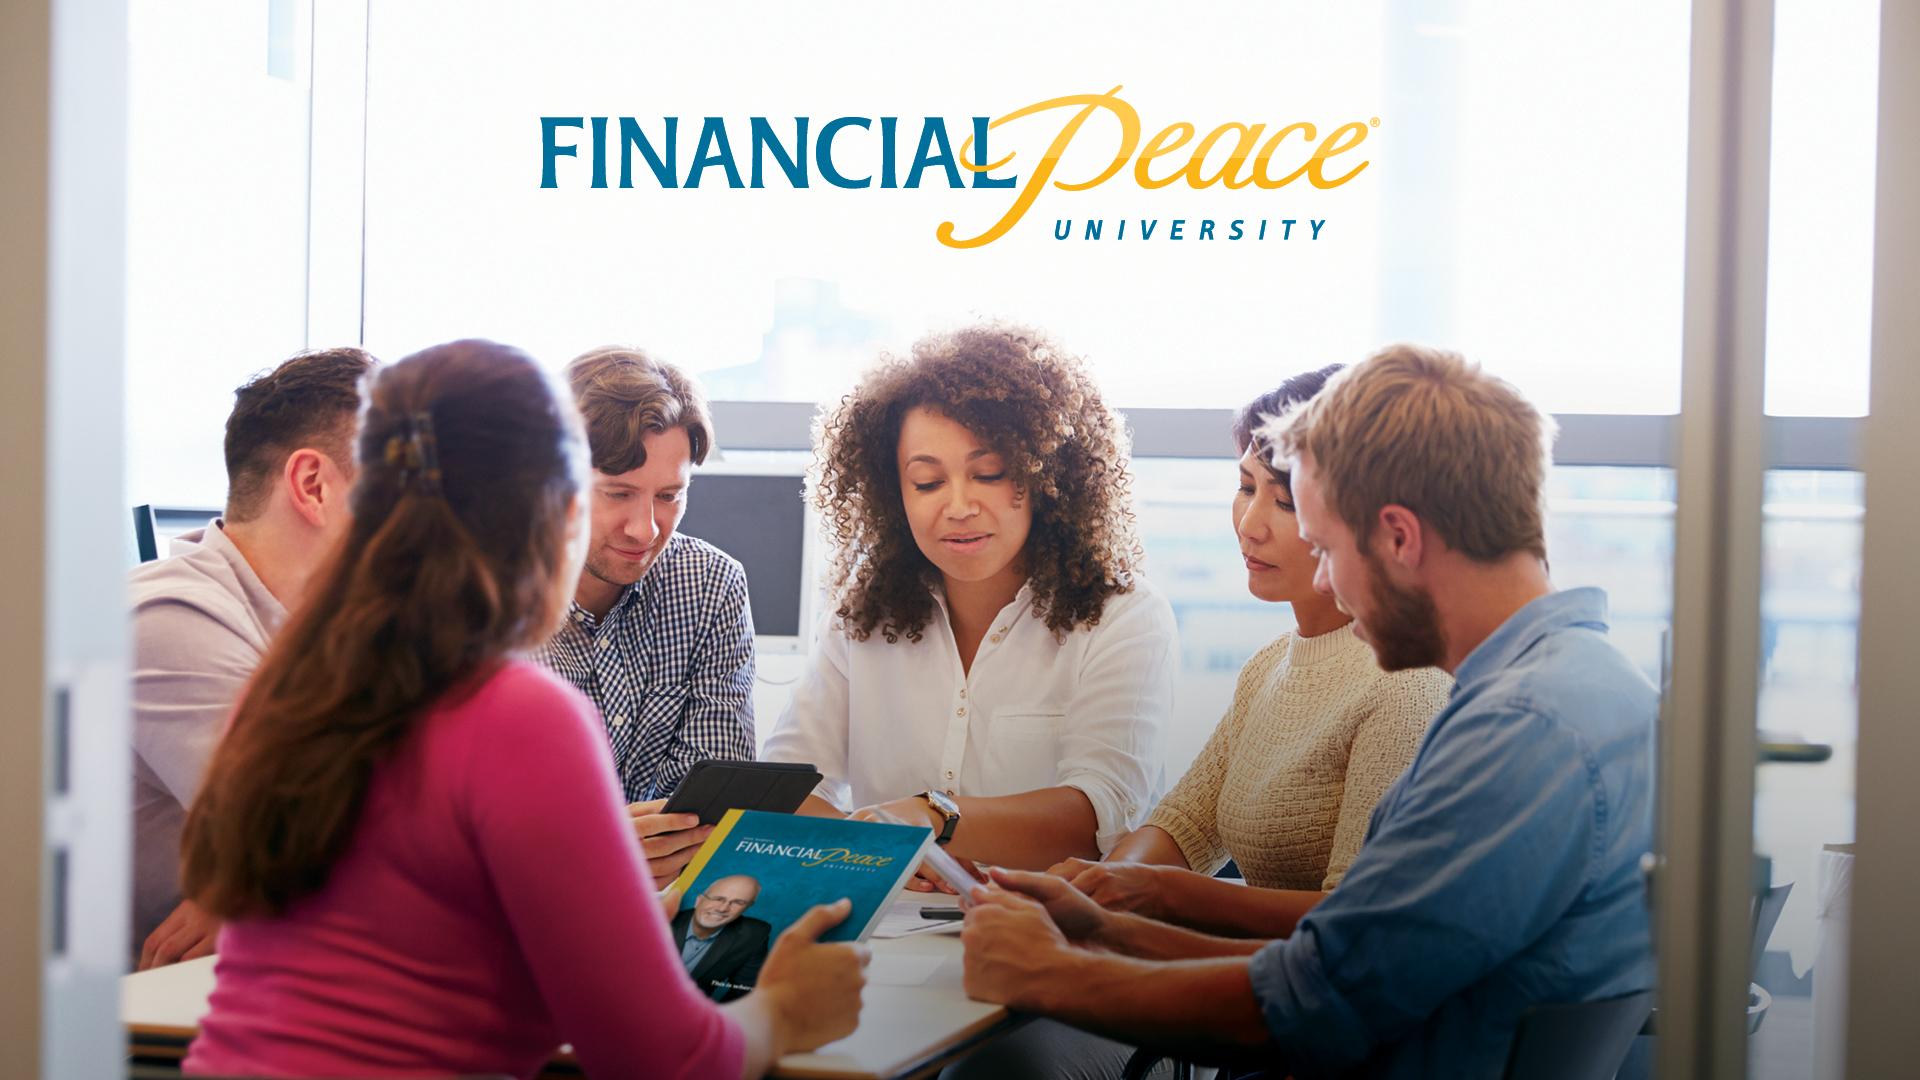 Financial peace slide classroom